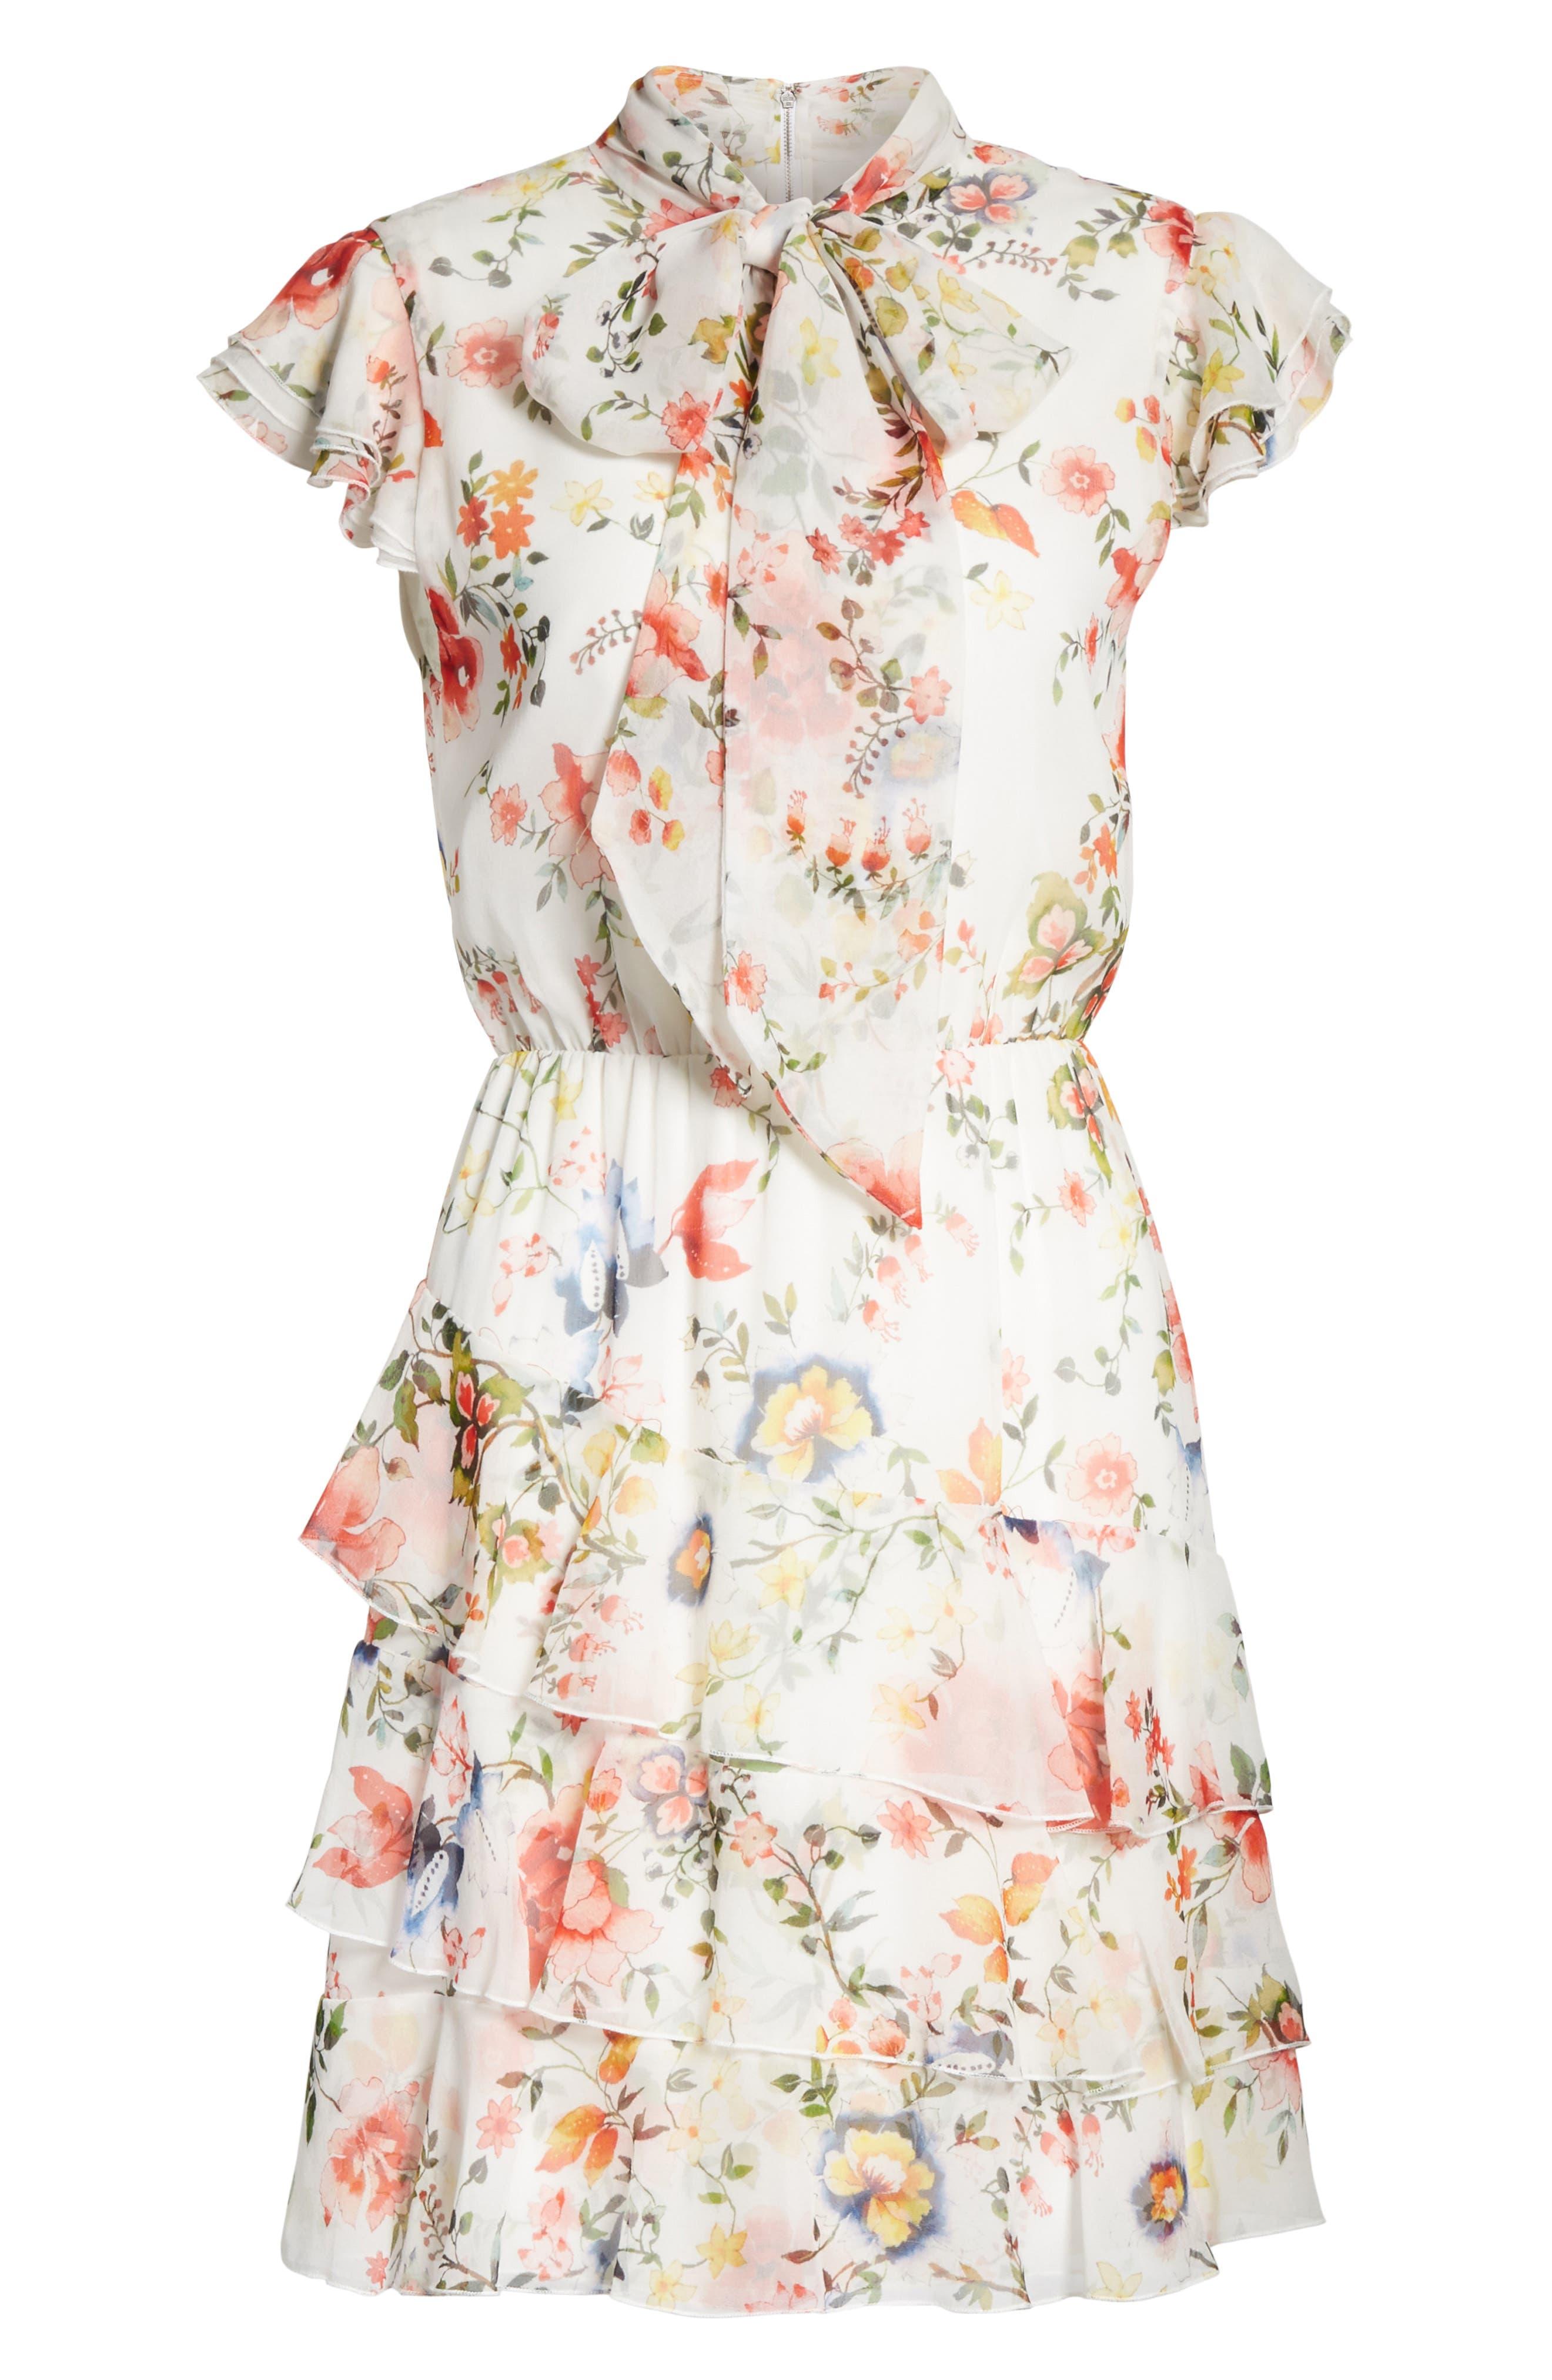 Lessie Ruffled Floral Silk Dress,                             Alternate thumbnail 6, color,                             Floral Soiree-Soft White